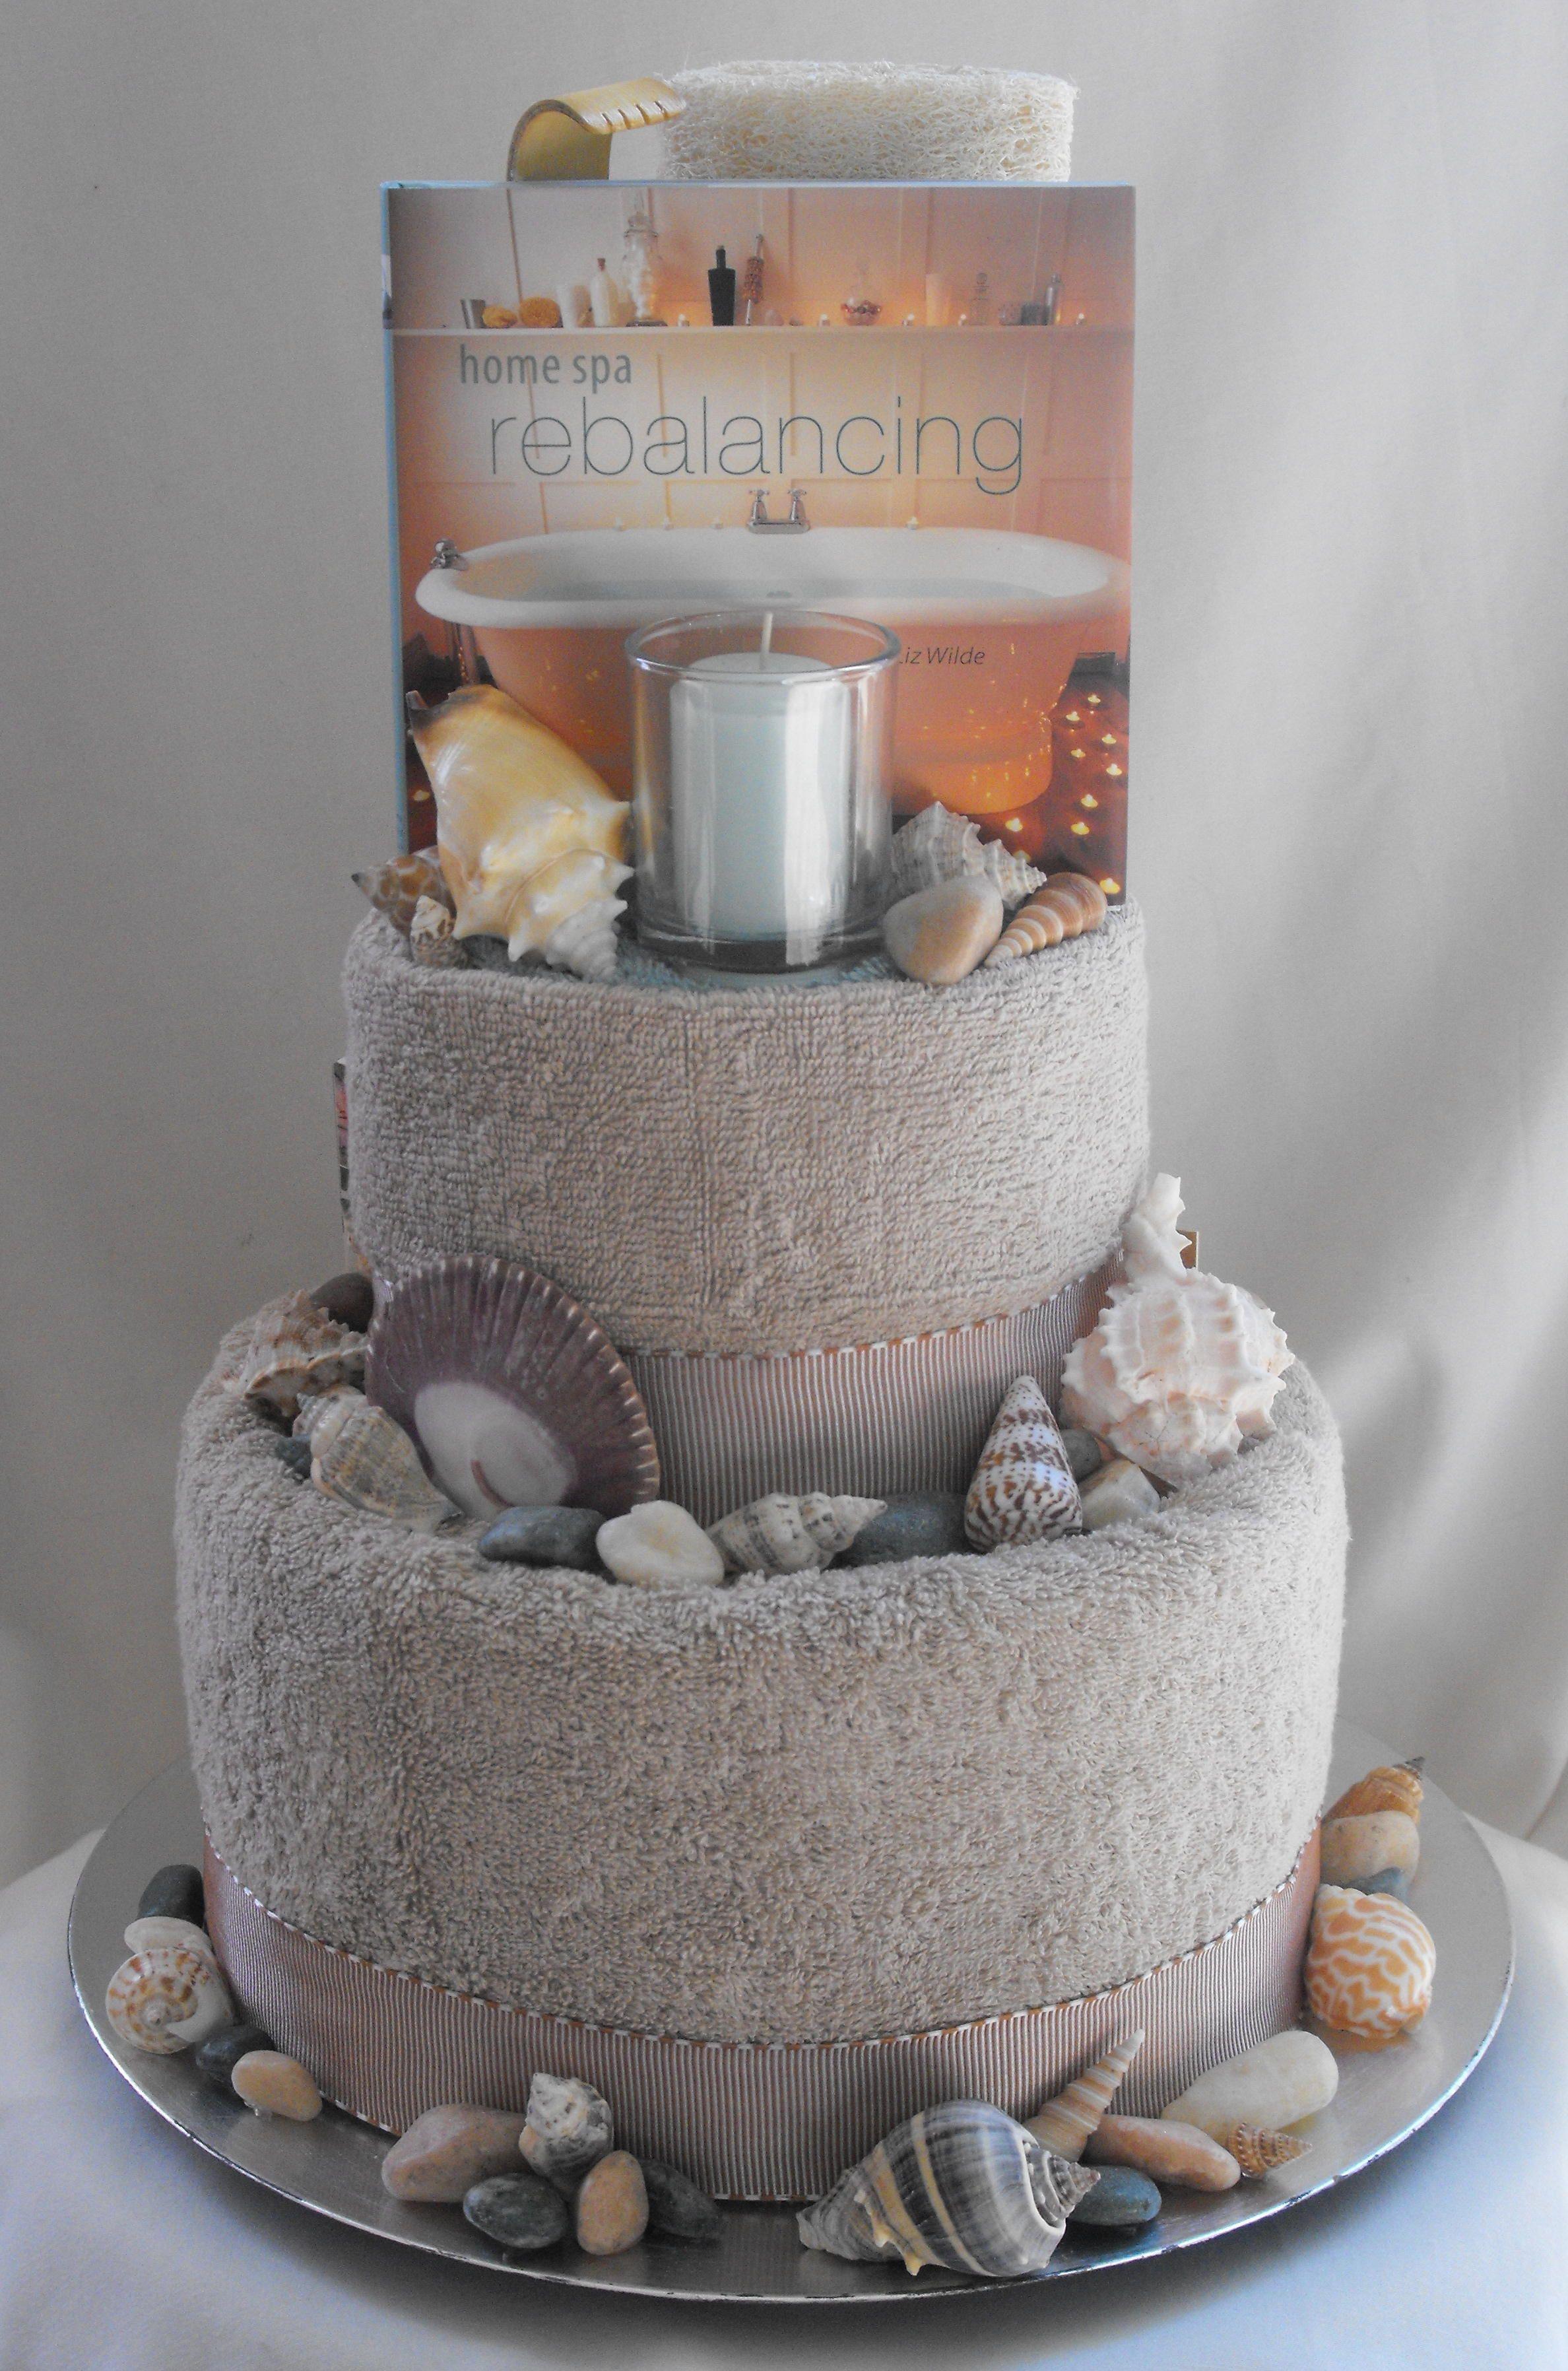 best homemade bridal shower gifts%0A Photo via  Spa CakeDiy Beauty Gift BasketUnique Gift Basket IdeasGift